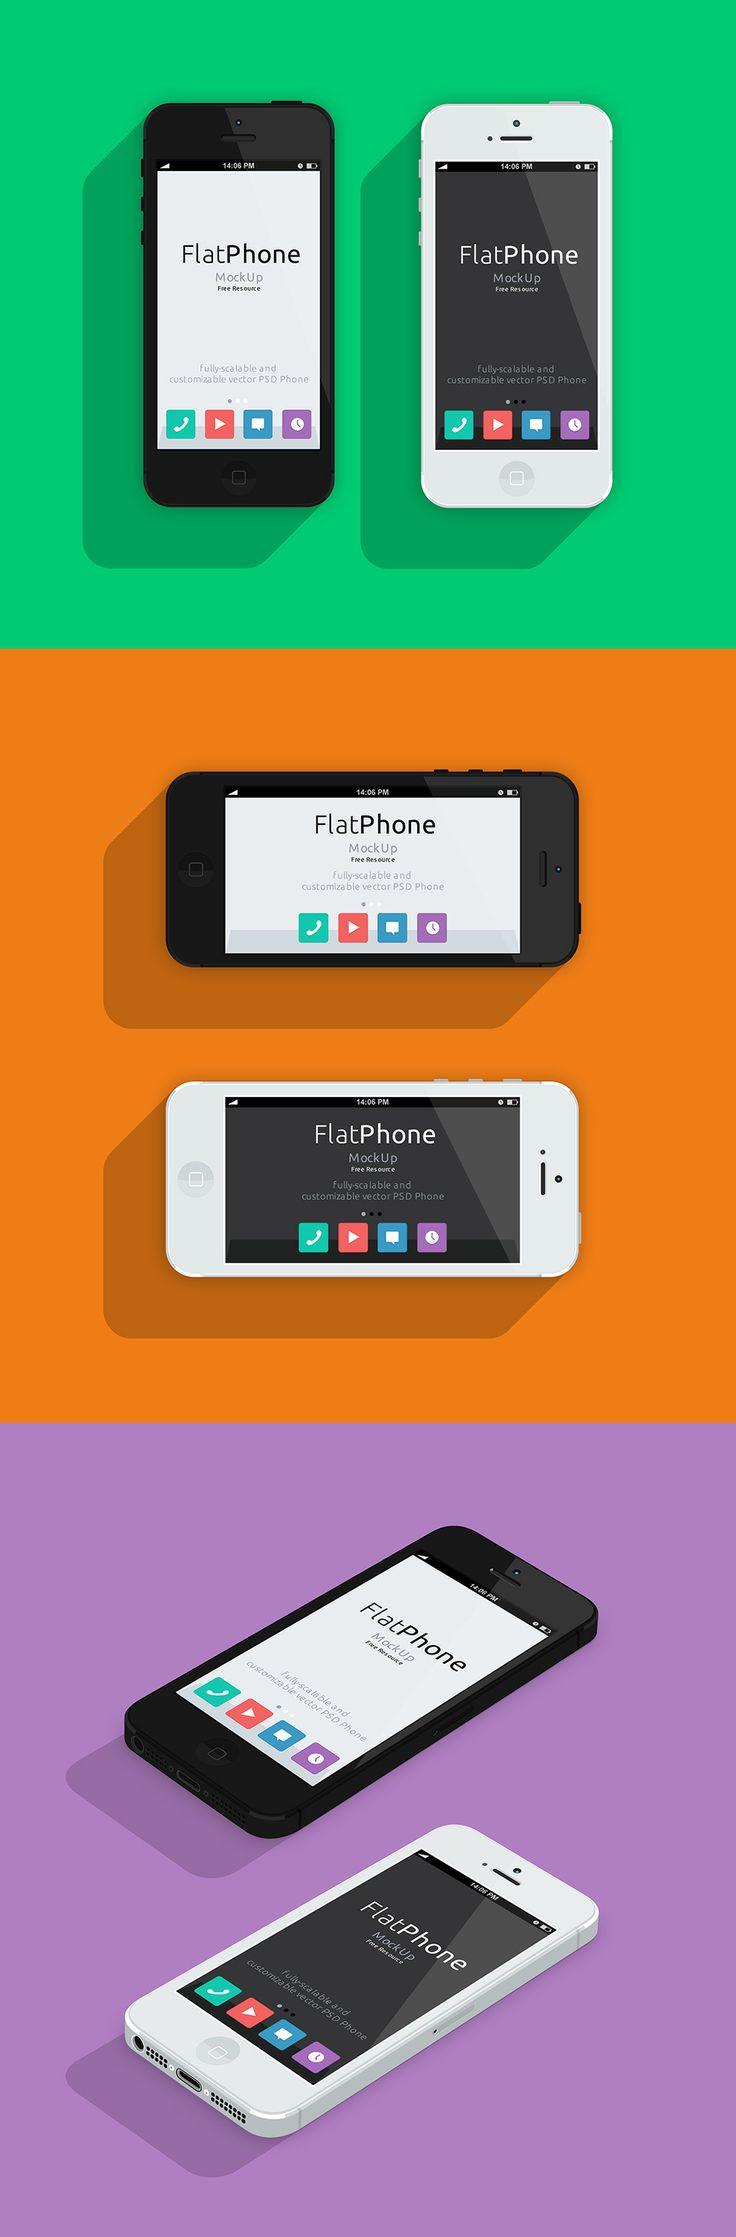 FlatPhone Mockup | Freebie San - Get your design freebies for all your design needs